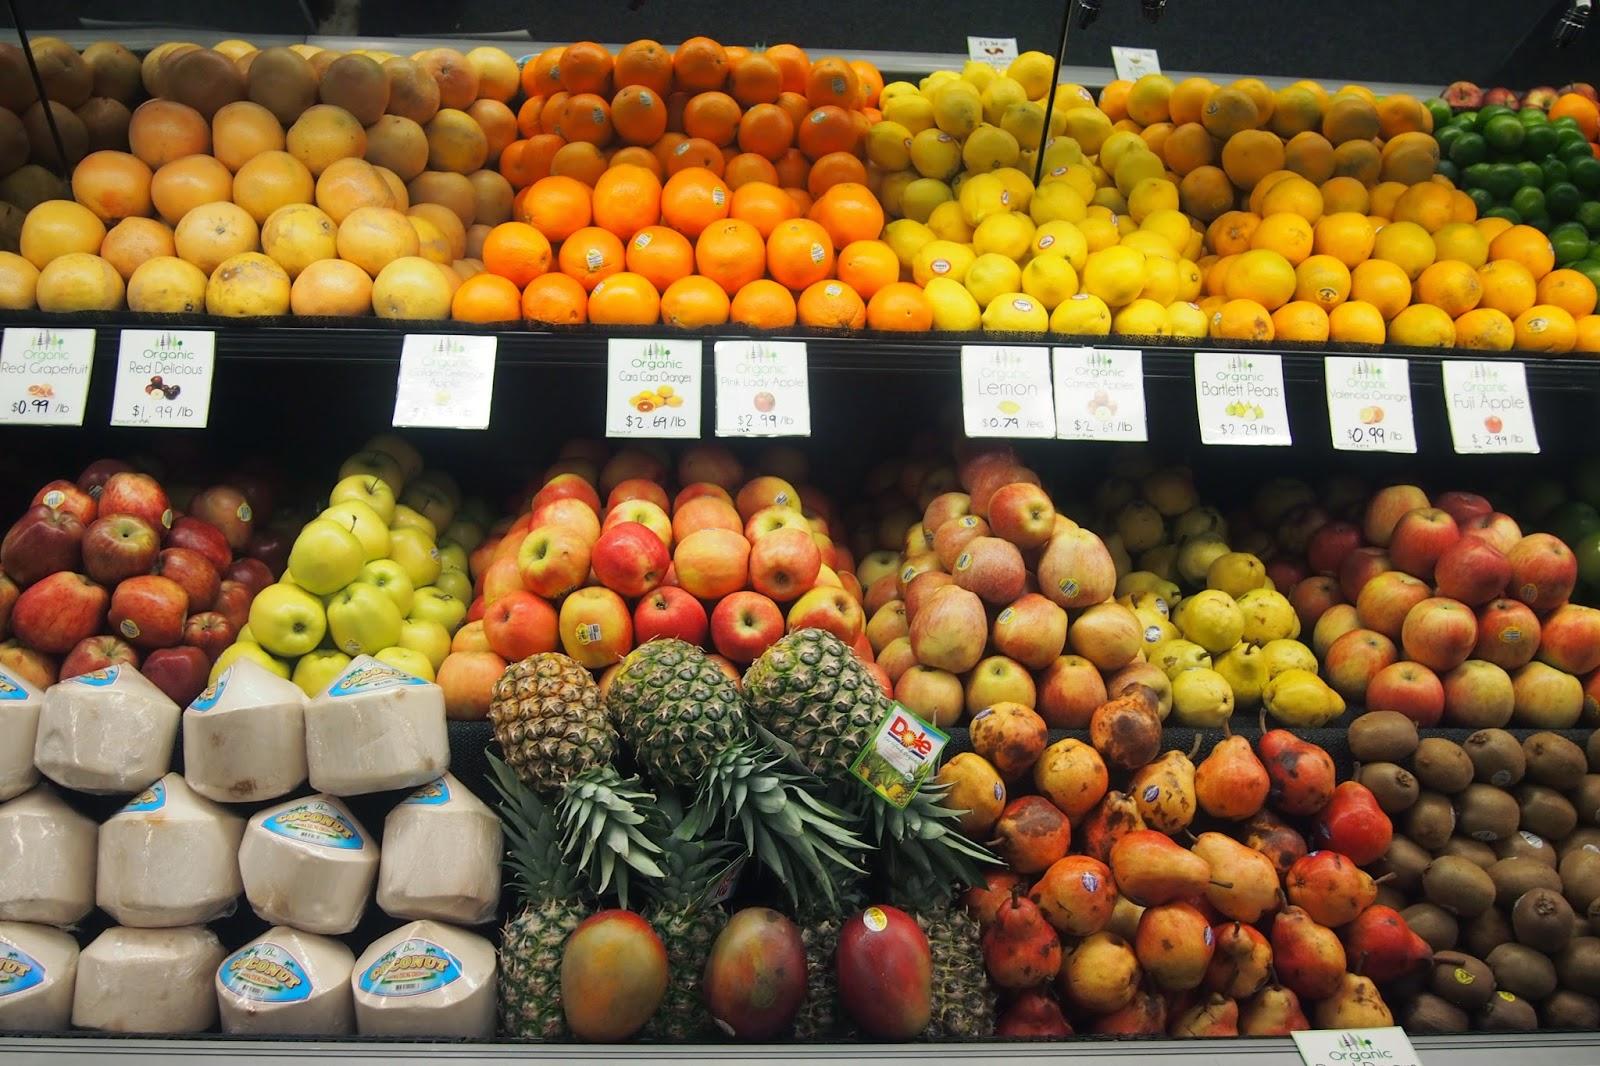 Fruit+veggie+smoothie+recipe - Green Smoothie Recipe & Video Tutorial